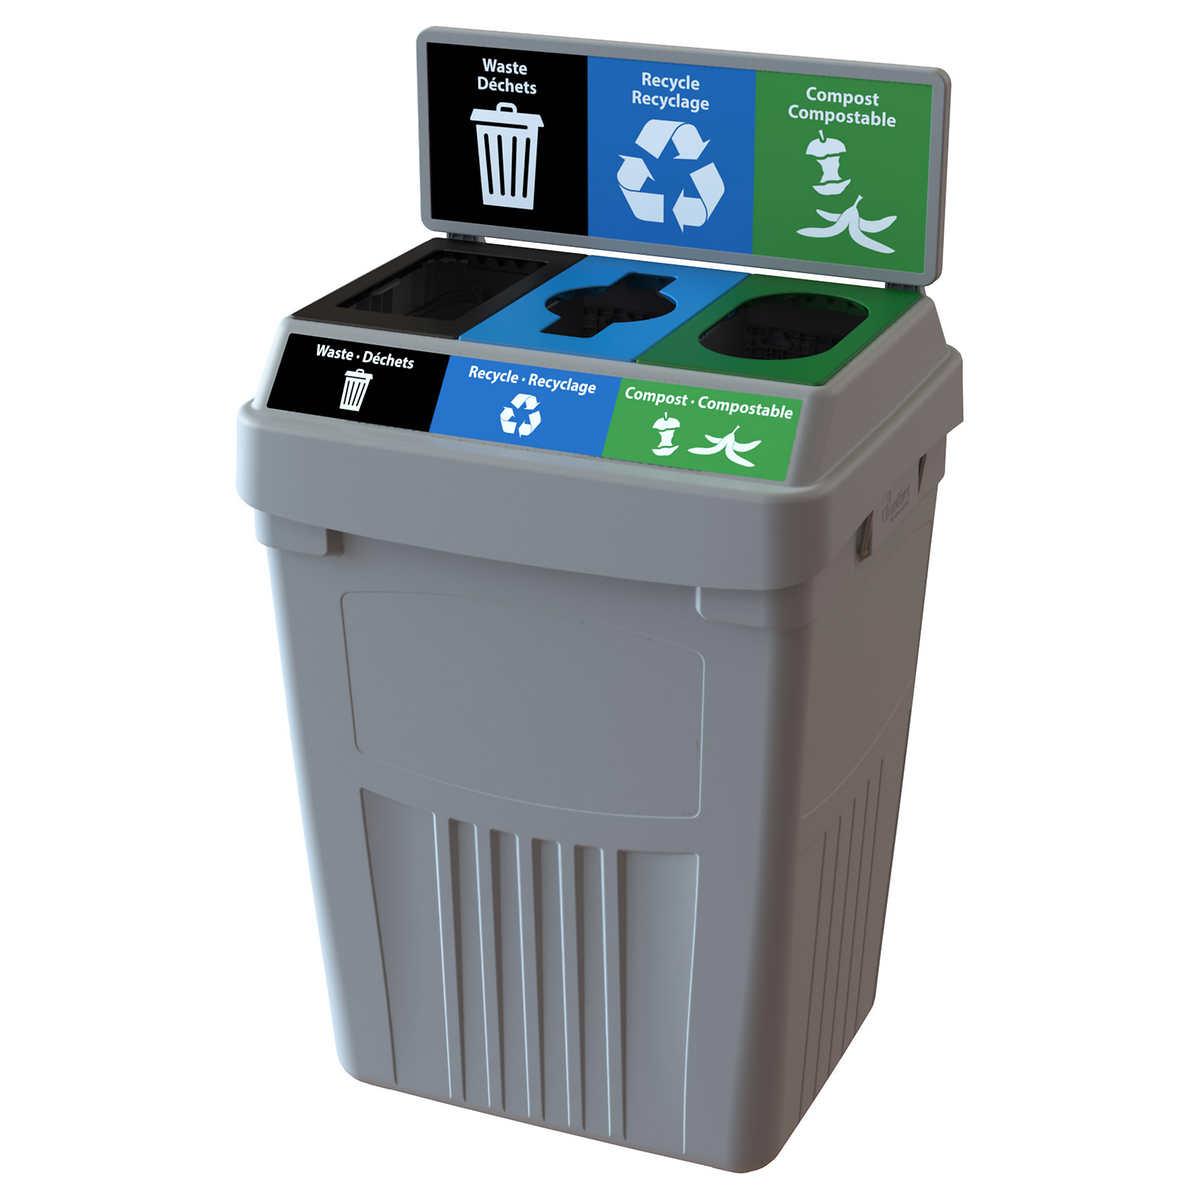 CleanRiver Flex E 3-in-1 Waste and Recycling Bin, 189 L (50 gal )